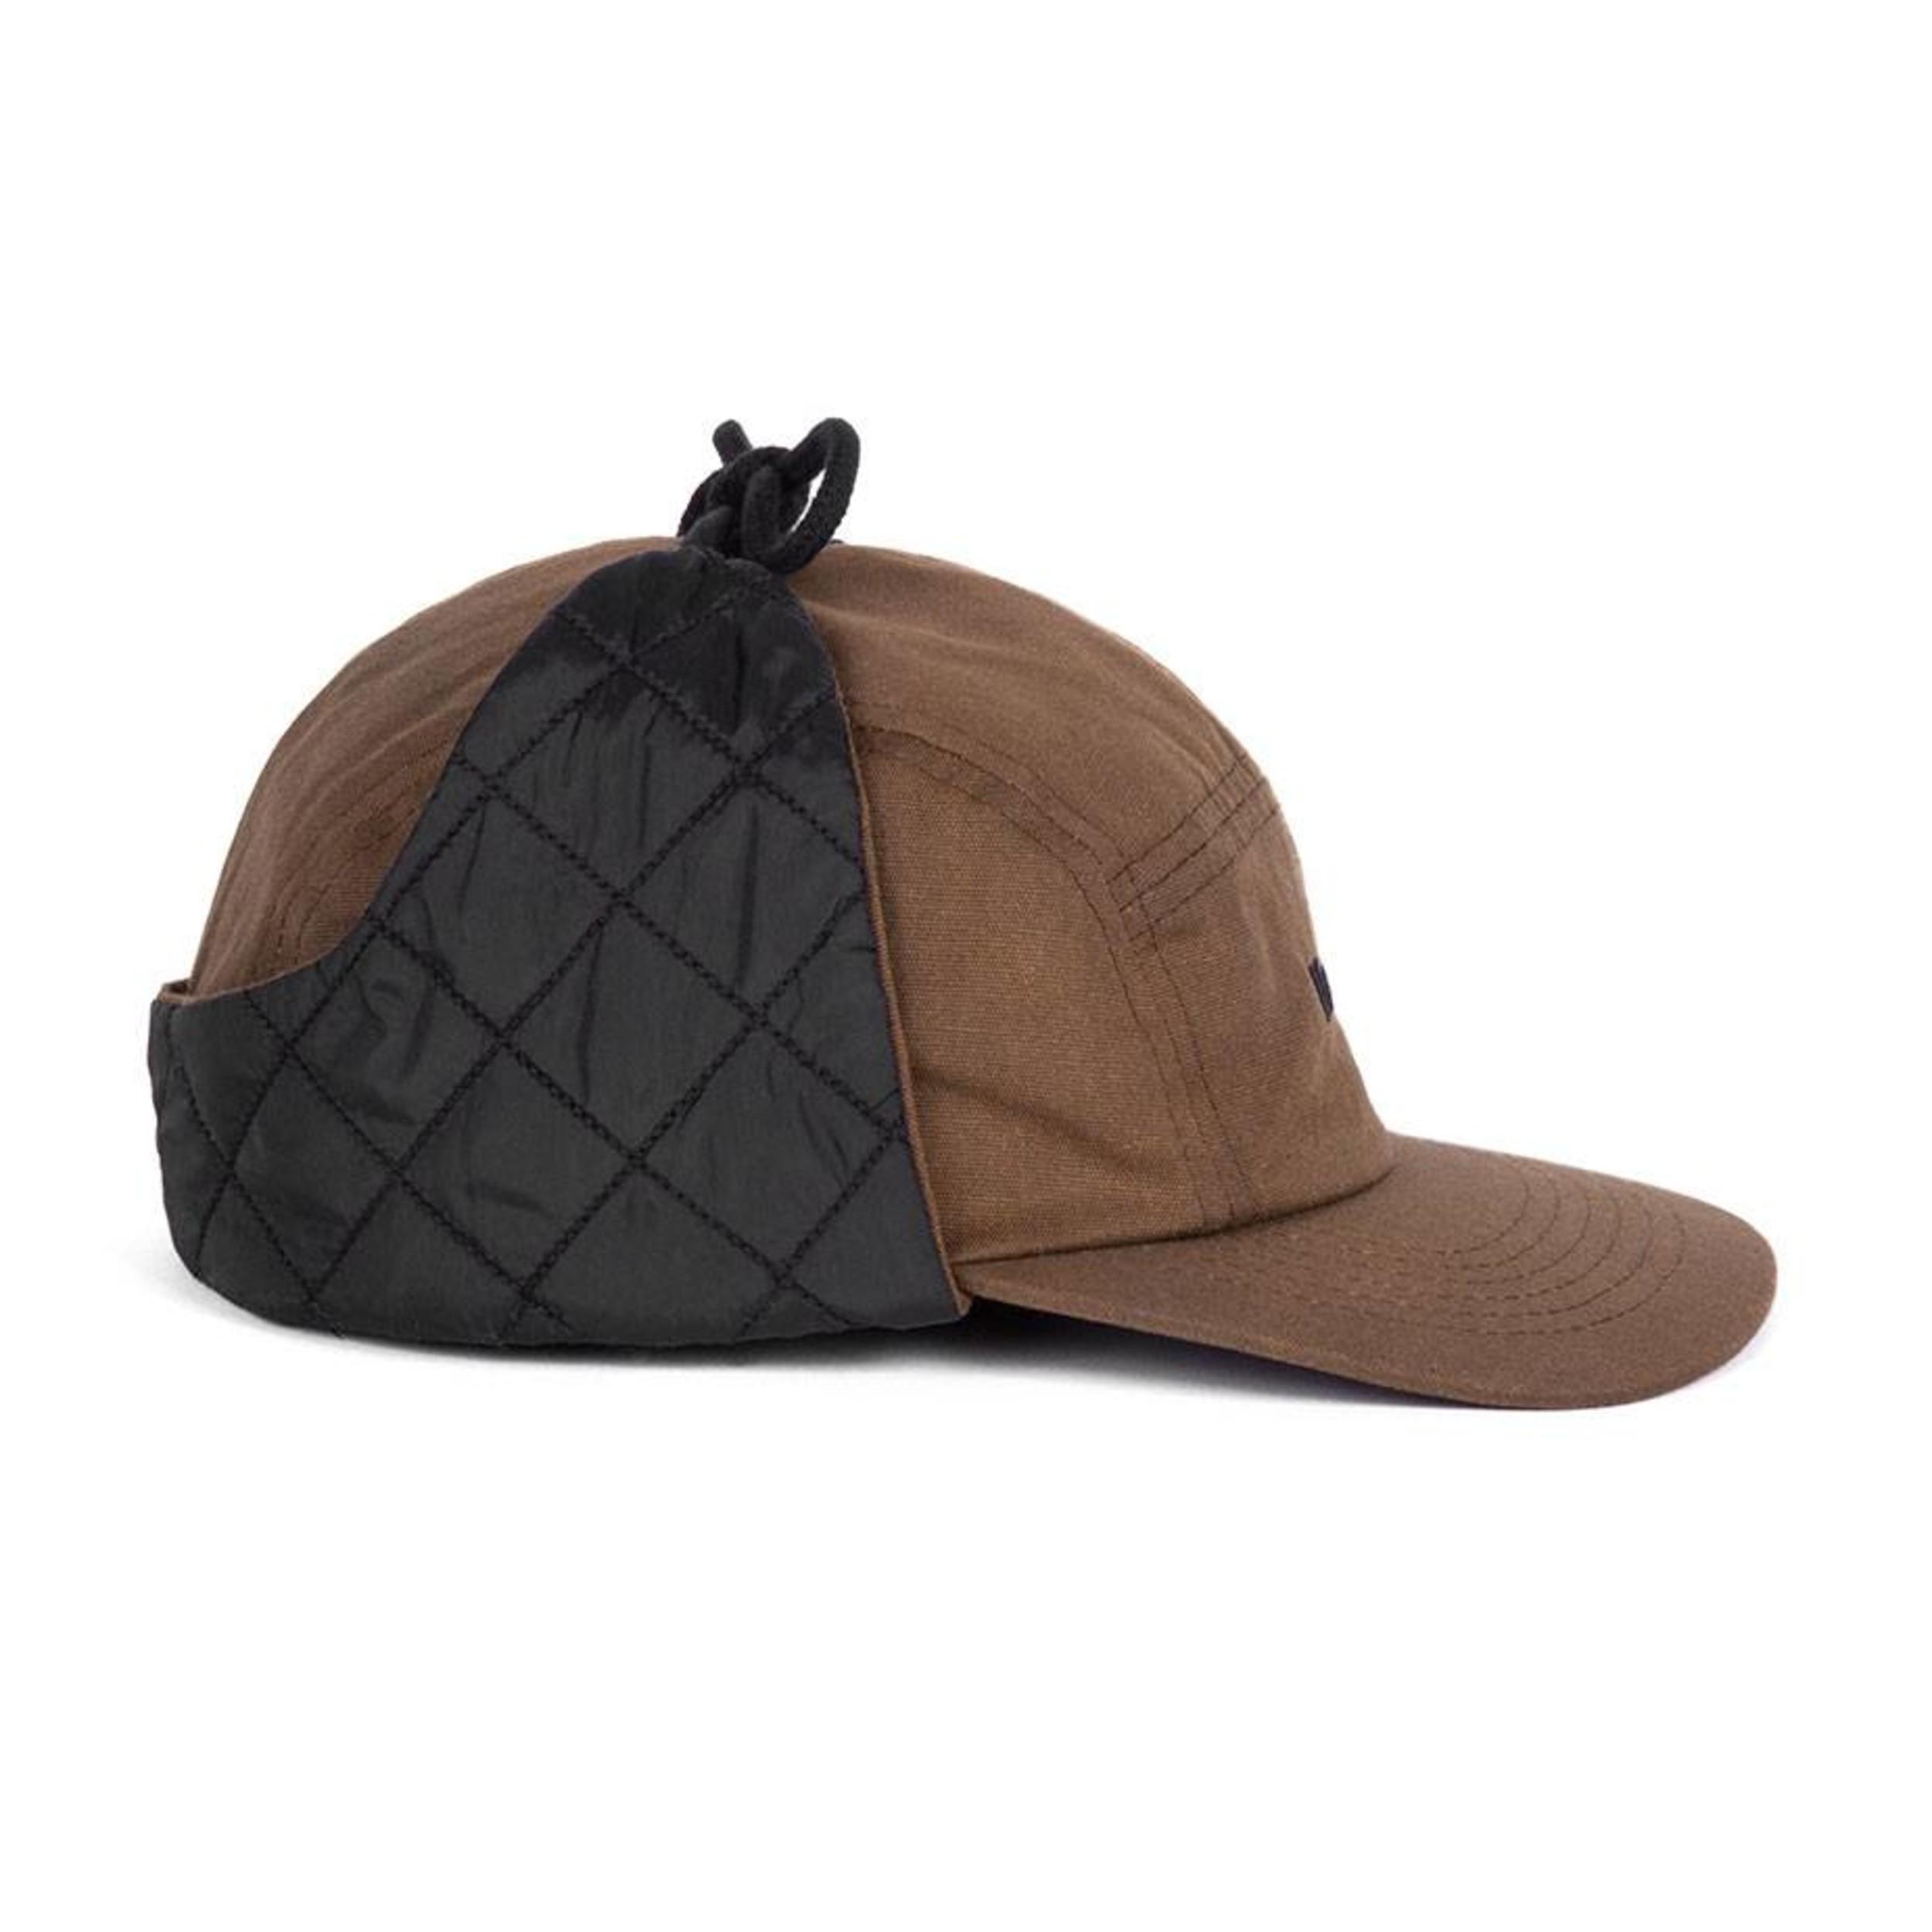 b05c439f2d7 Ear Flap Camper Hat - Brown